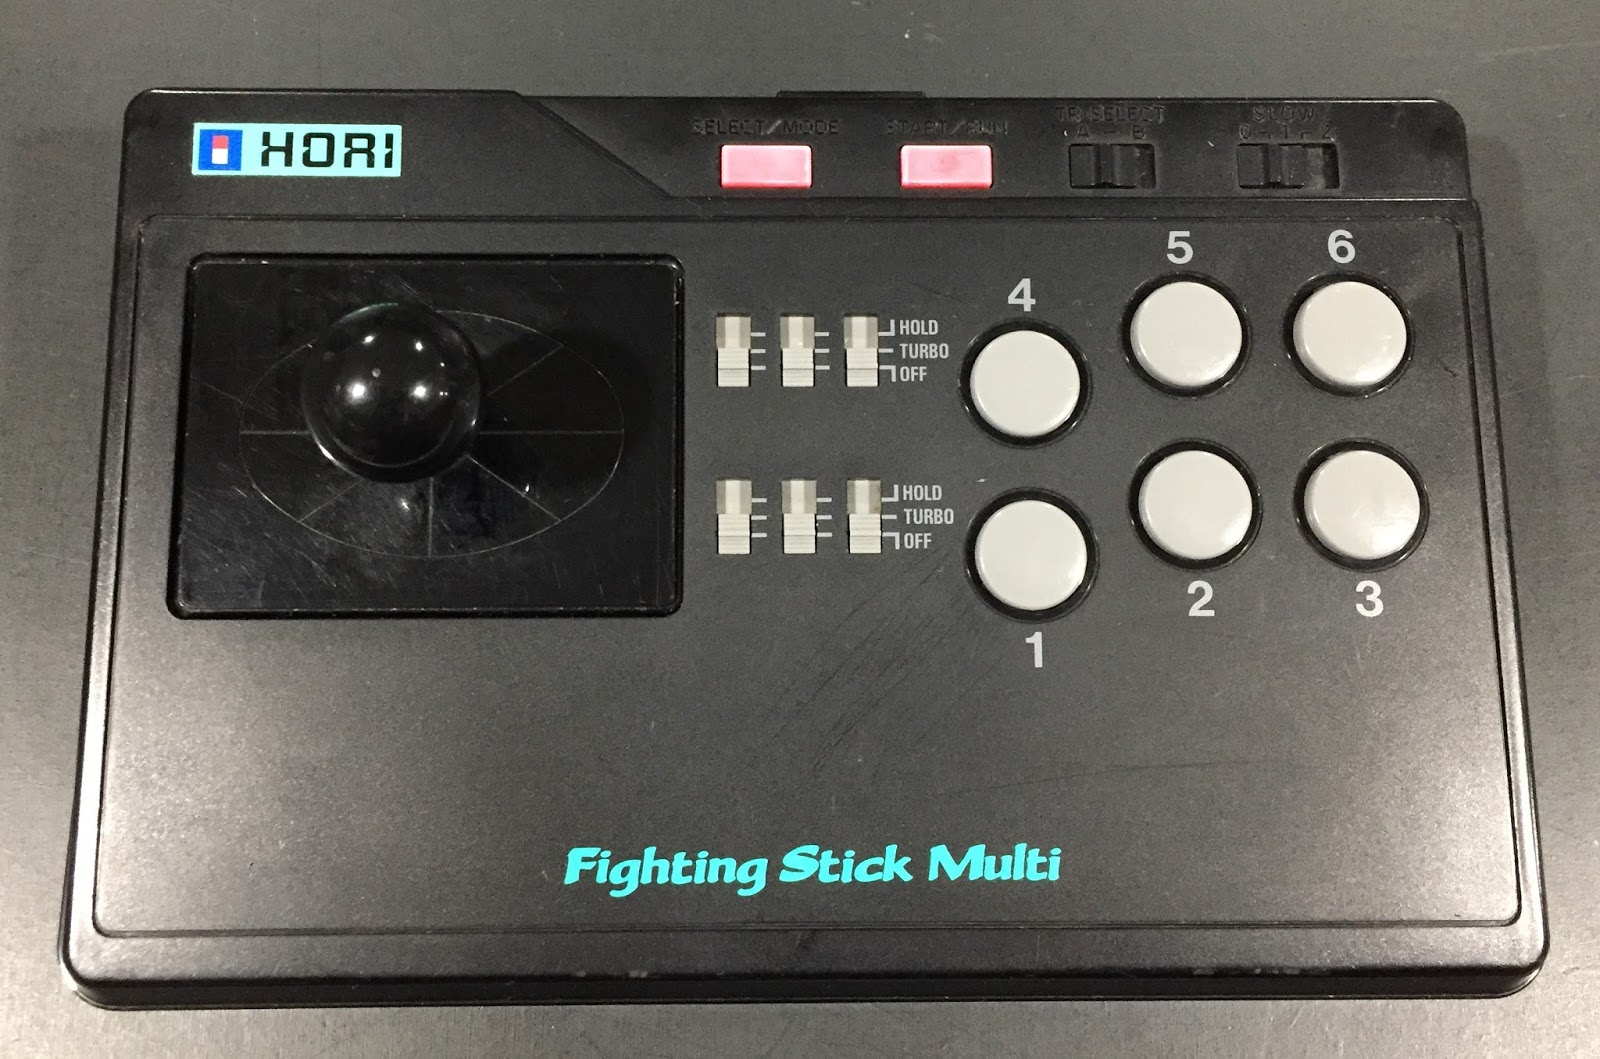 Retro Gamer Randomness: Hori Fighting Stick Multi for PC